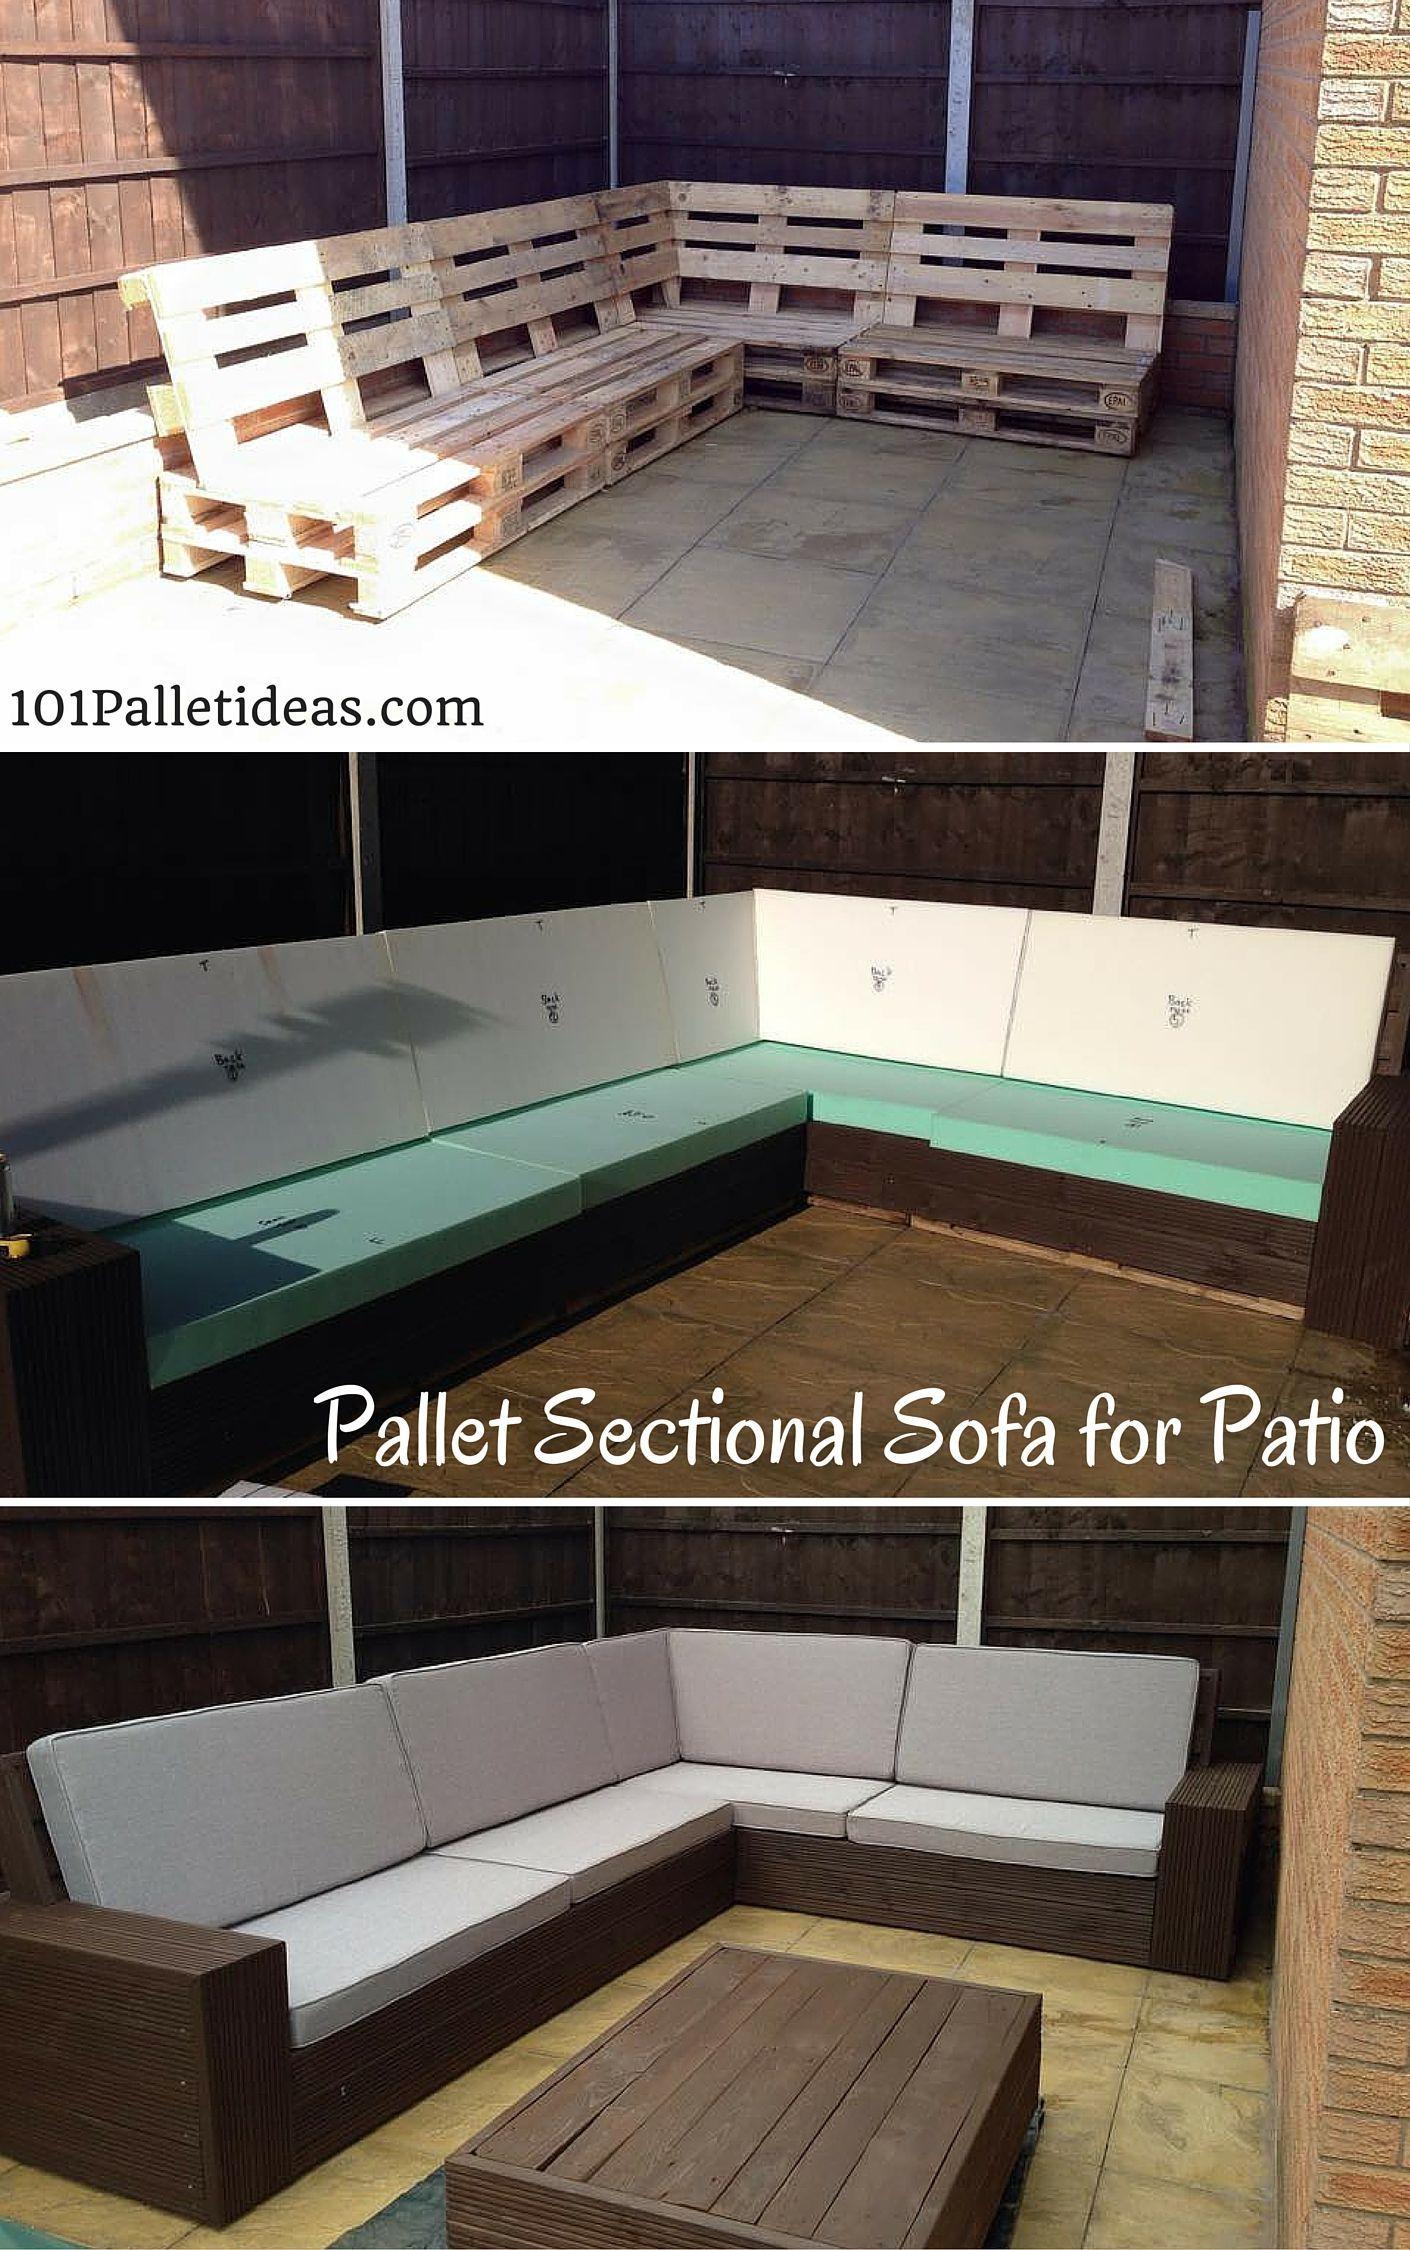 Canape D Angle En Palette Élégant Photos Diy Pallet Sectional sofa for Patio Self Installed 8 10 Seater